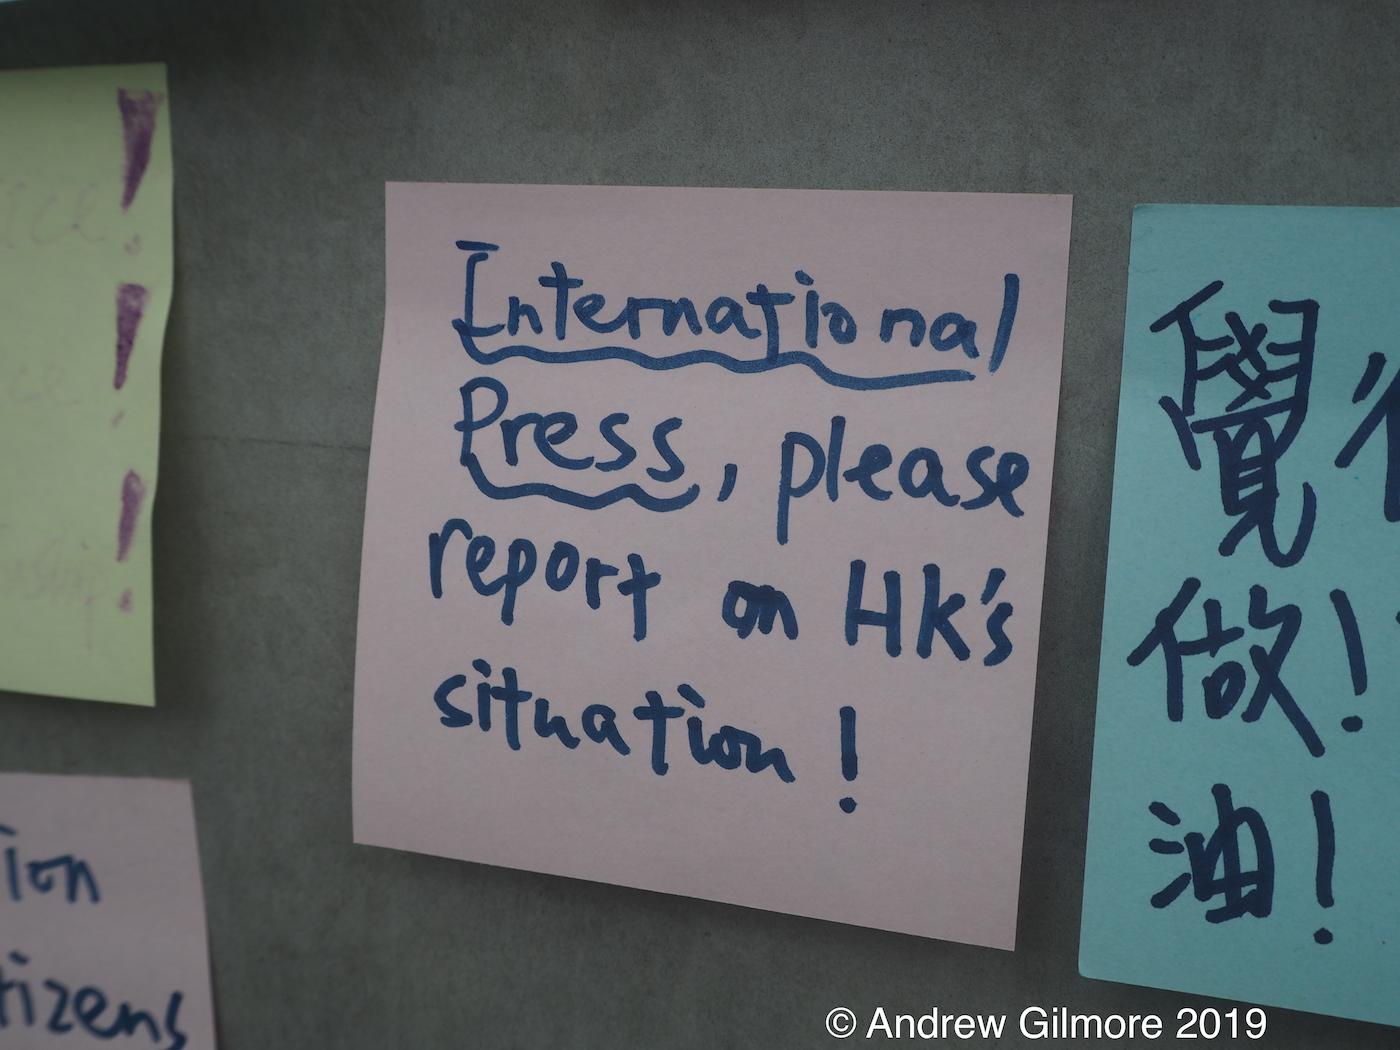 Hong Kong protestors please